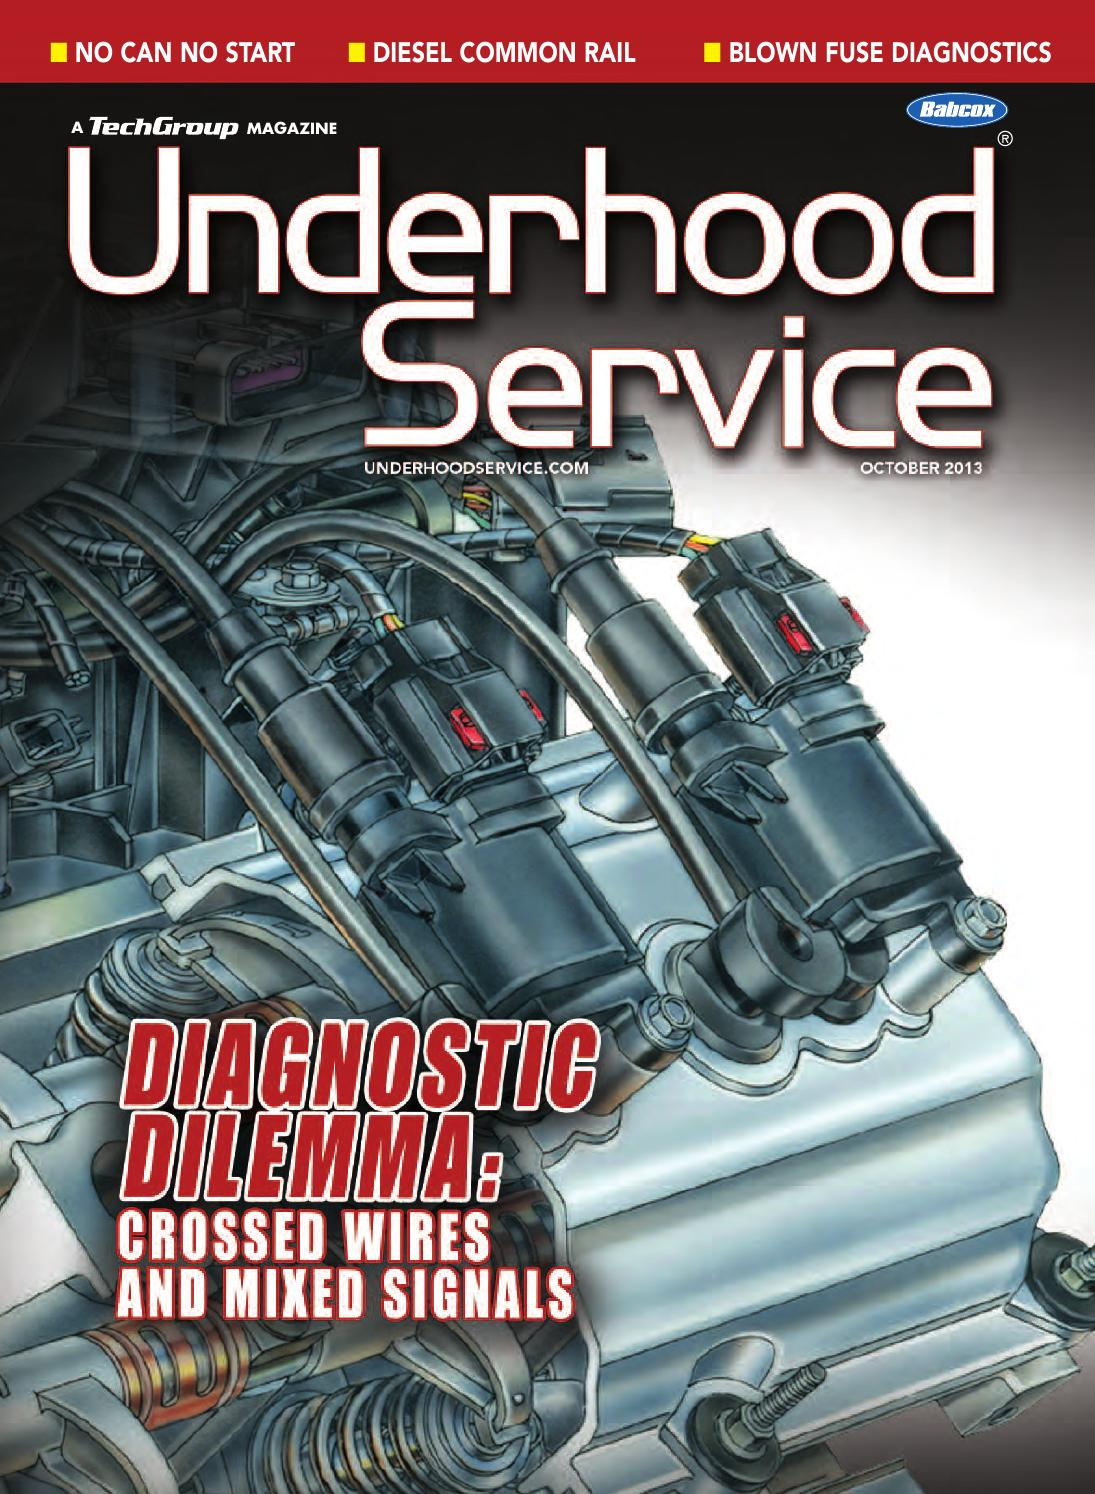 Cardone Service Plusr 3r705 Jeep Wrangler 2011 Power Steering